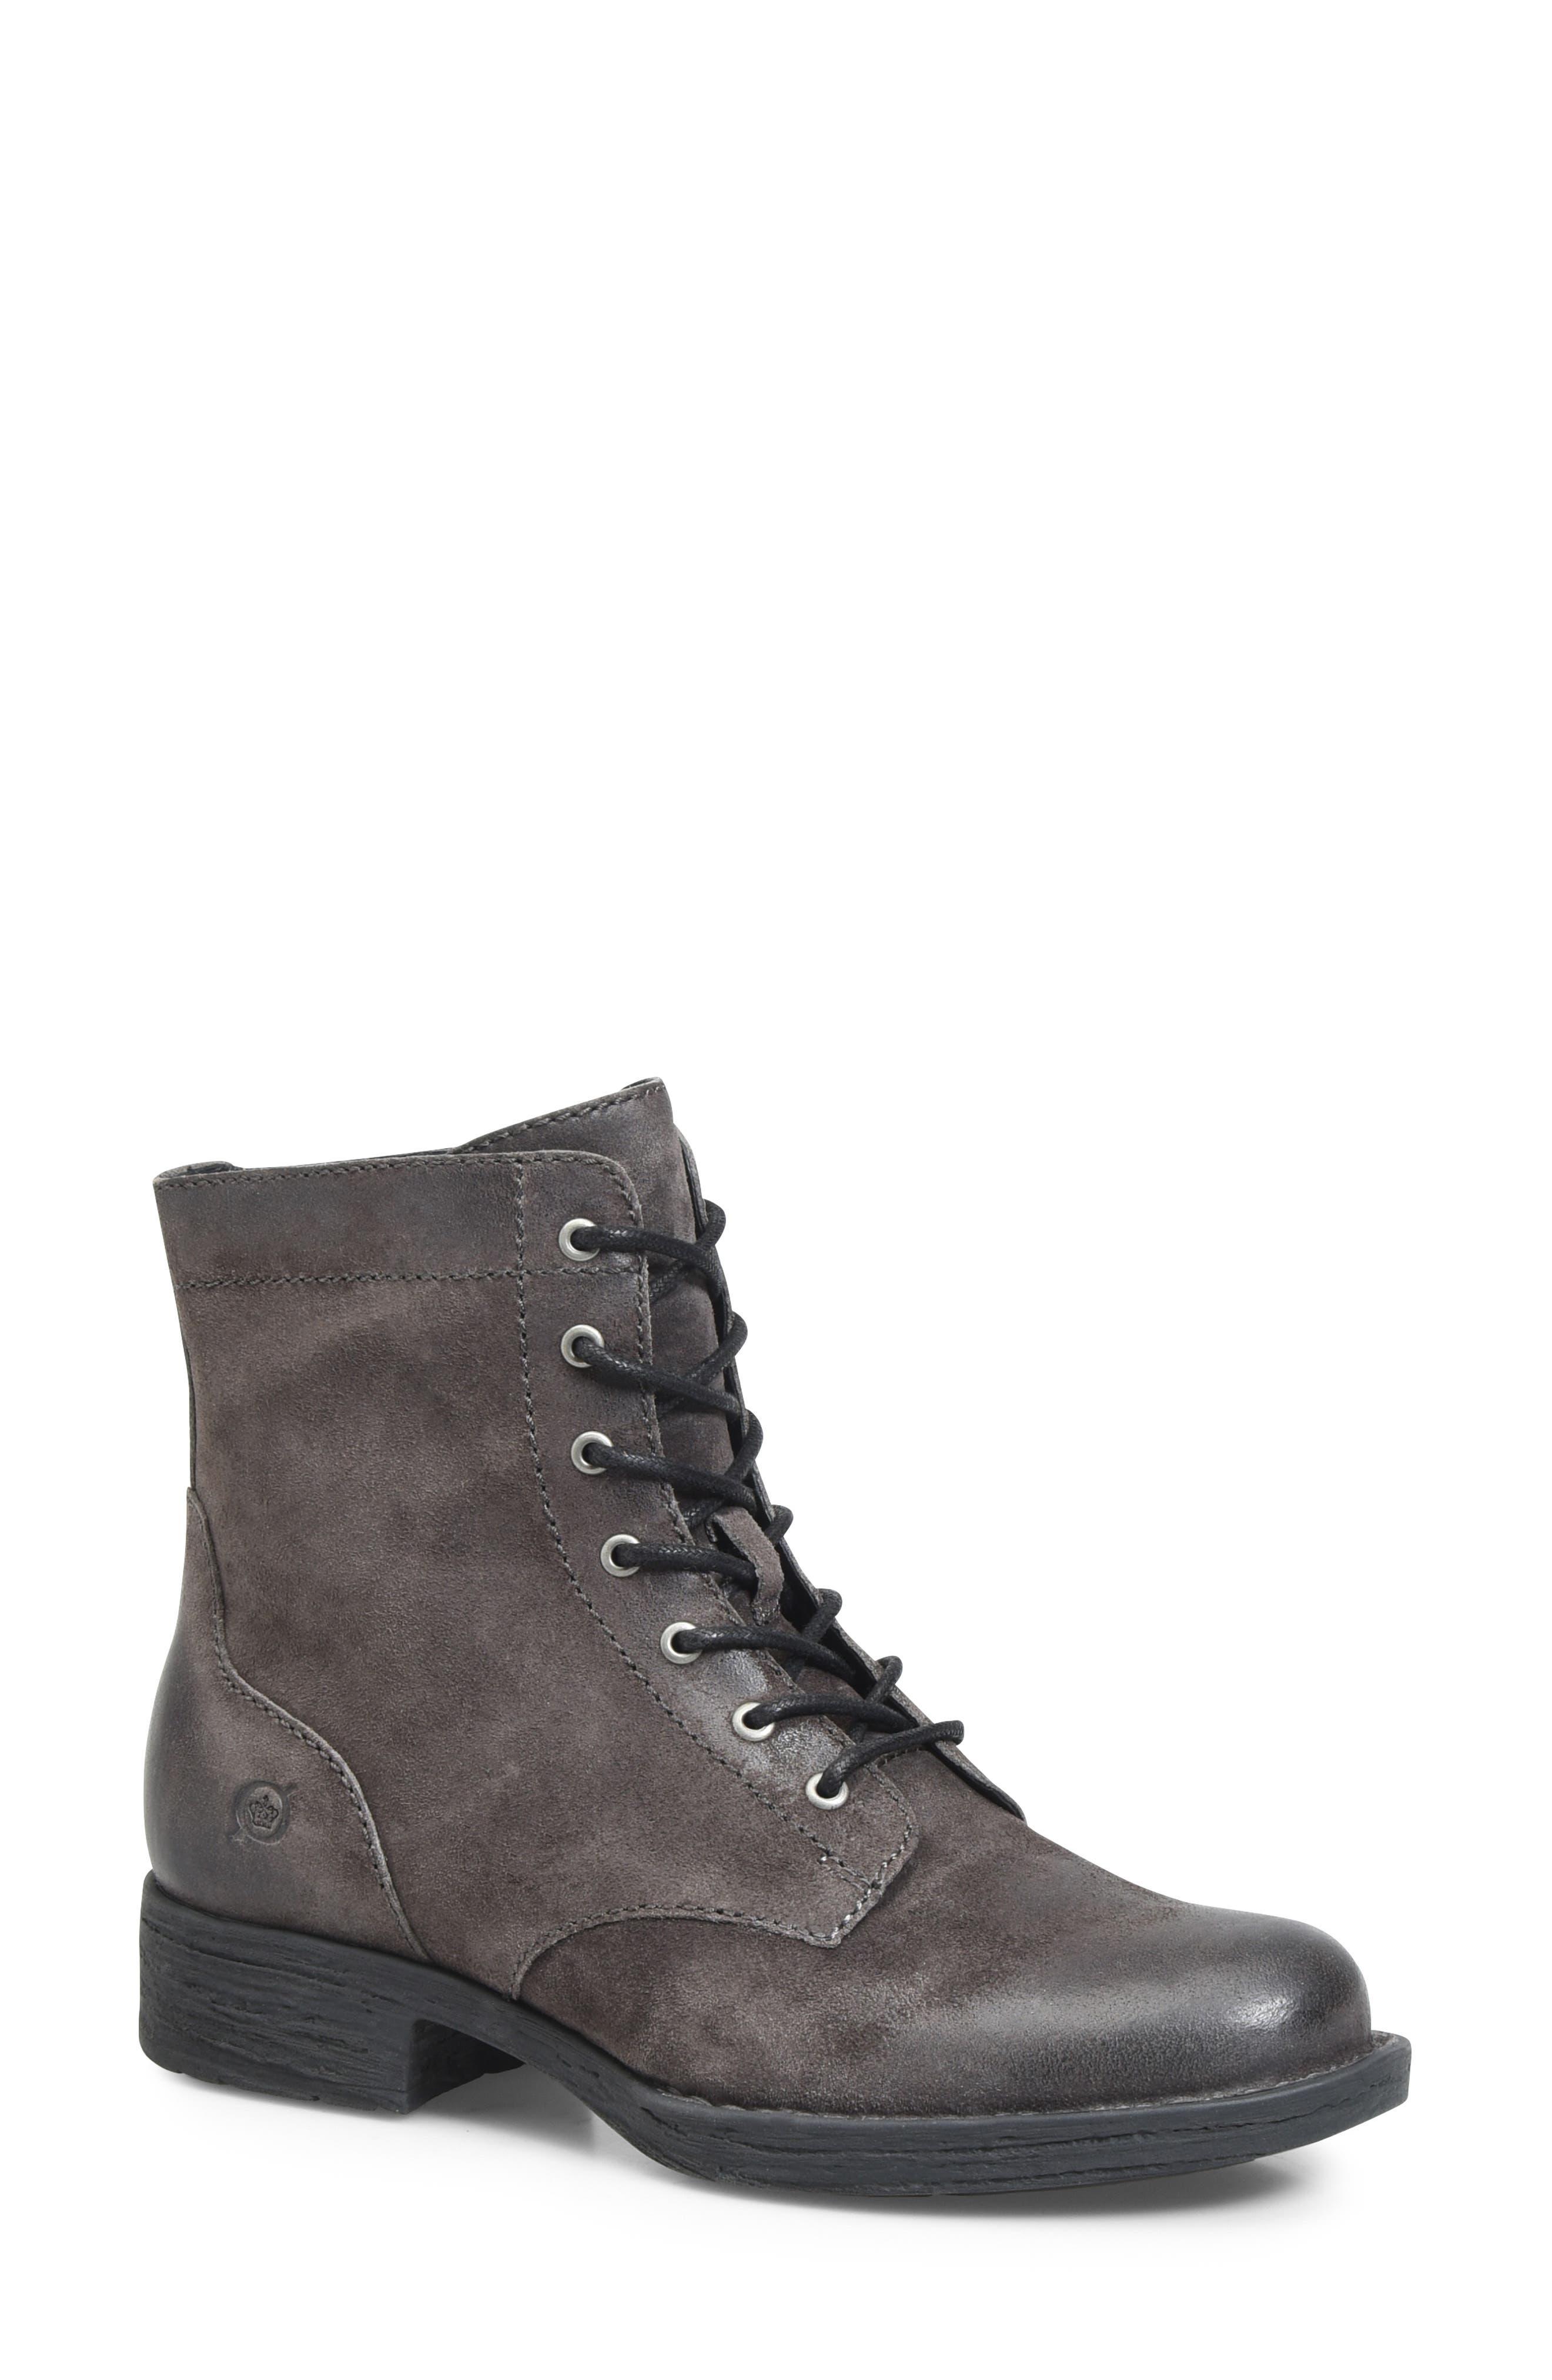 B?rn Evans Boot, Grey